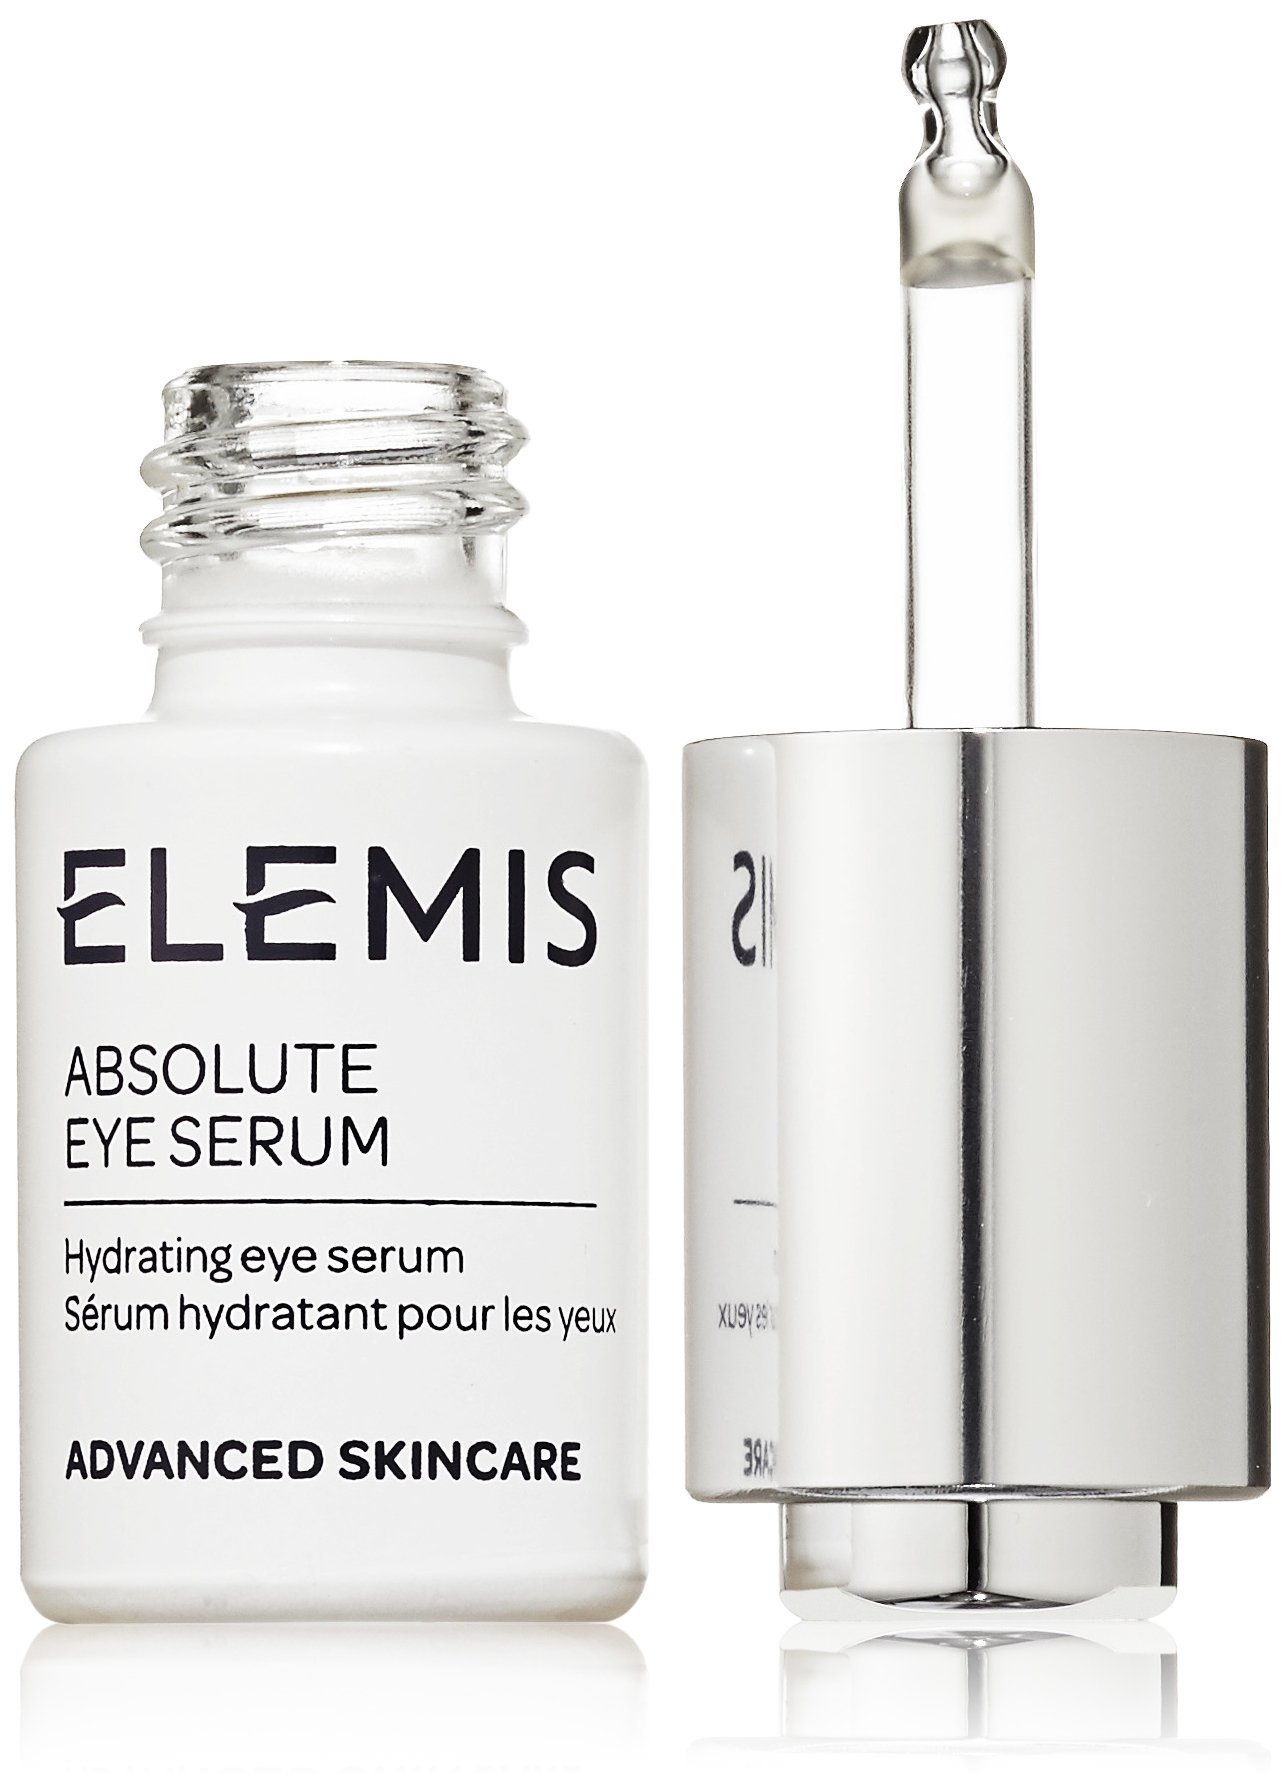 ELEMIS Absolute Eye